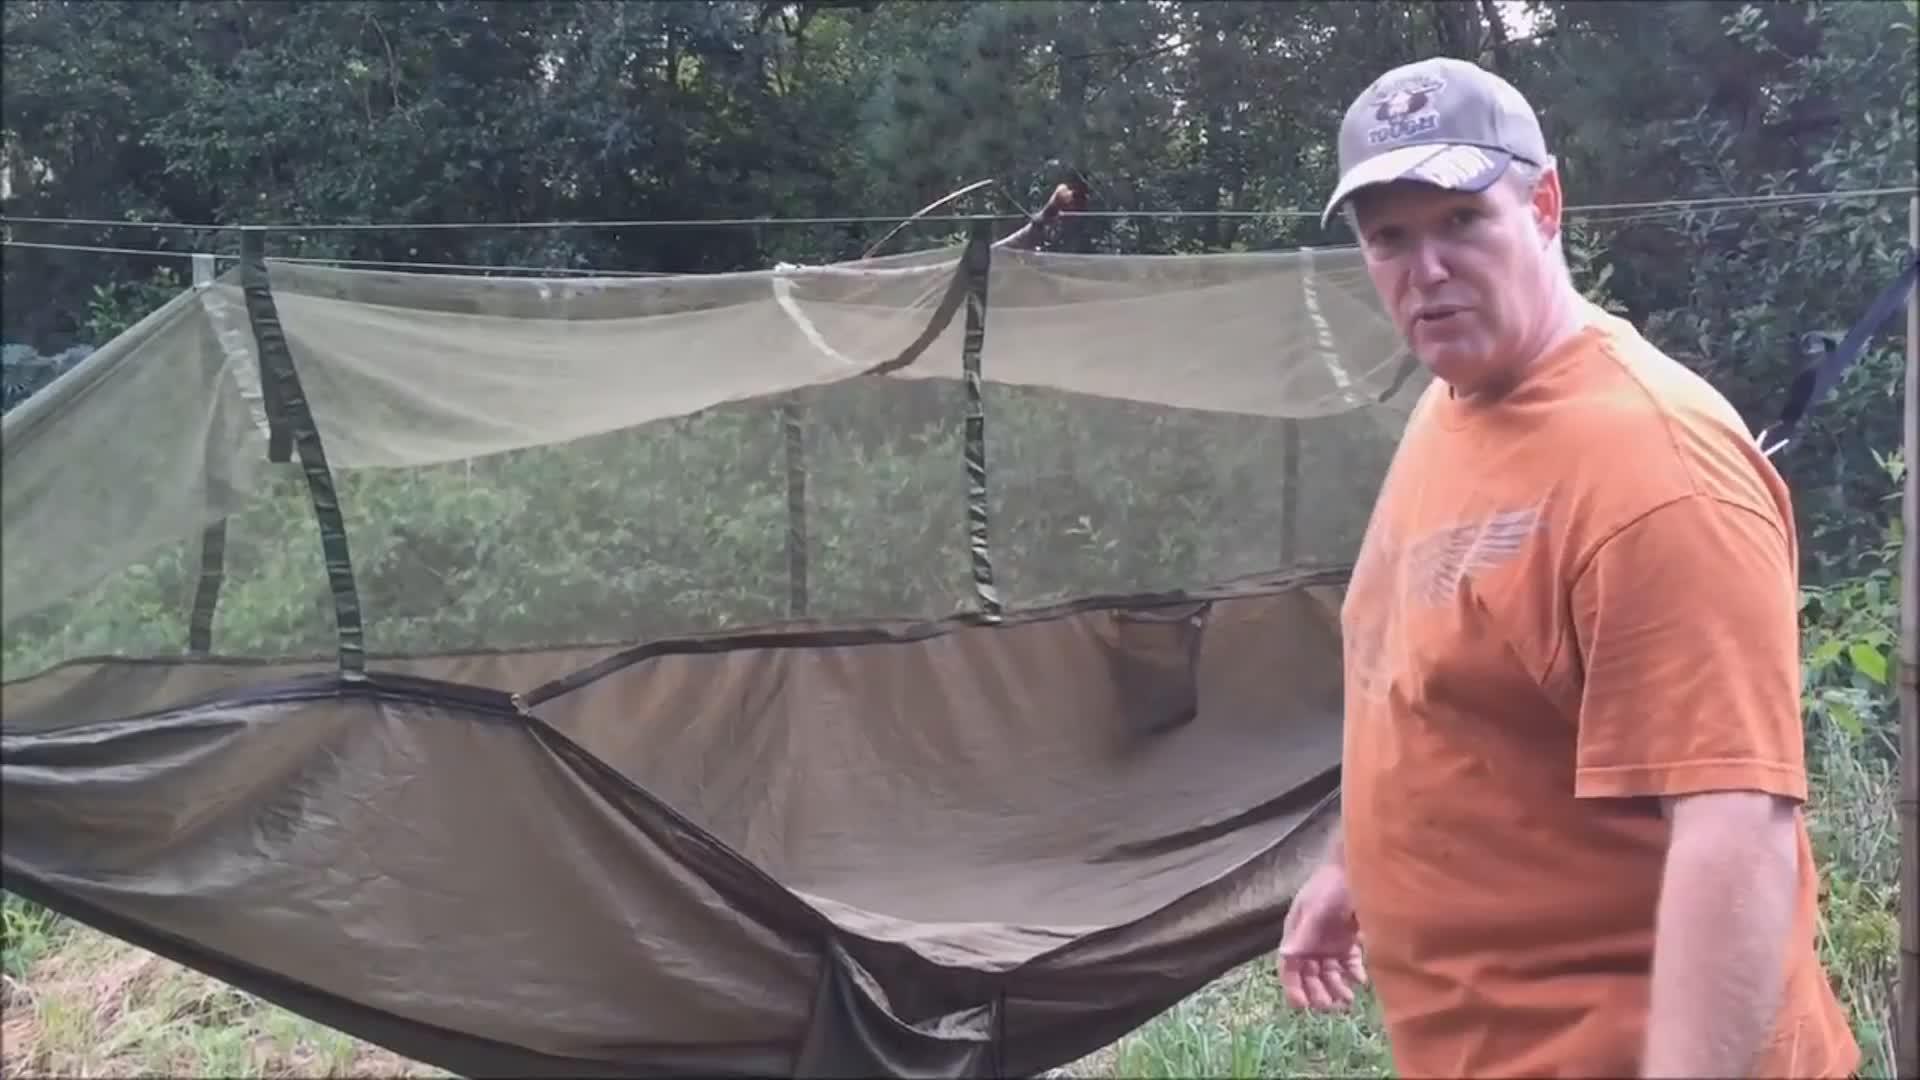 Custom wholesale Ultralight Outdoor Camping Hunting Mosquito Net Parachute Hammock 2 Person Garden Hanging Bed Leisure Hammock